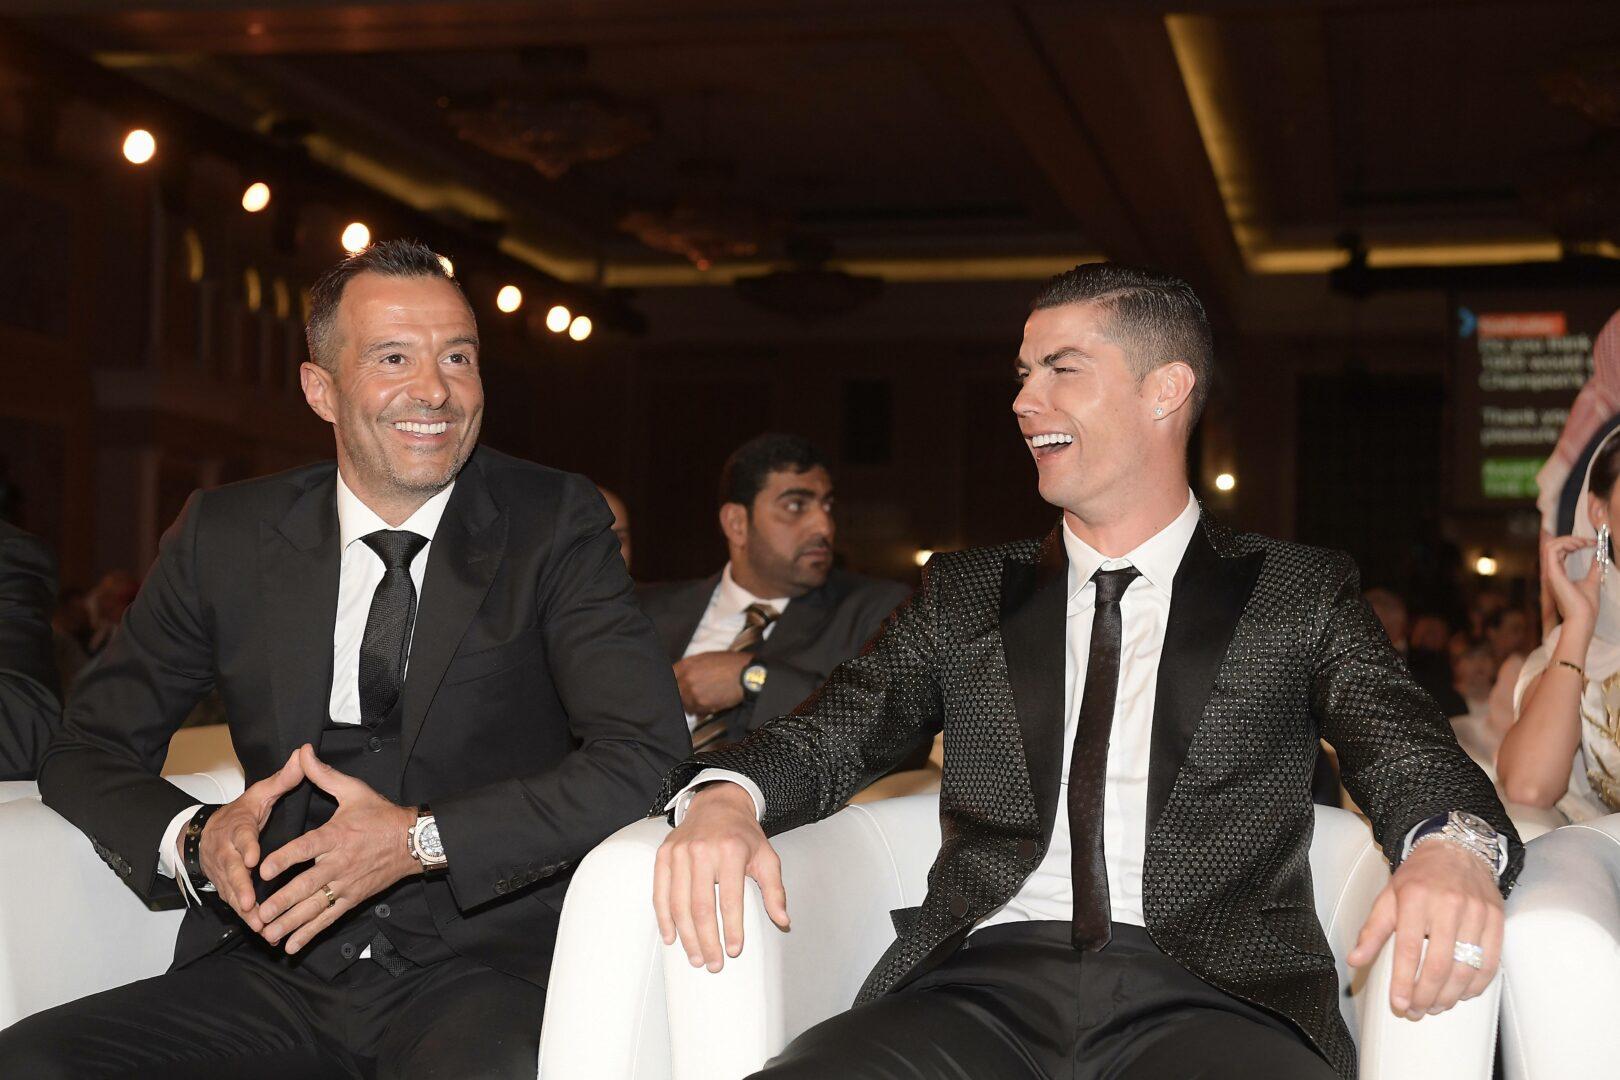 Cristiano Ronaldo (Juventus) Anwalt Jorge Mendes bei Preisverleihung